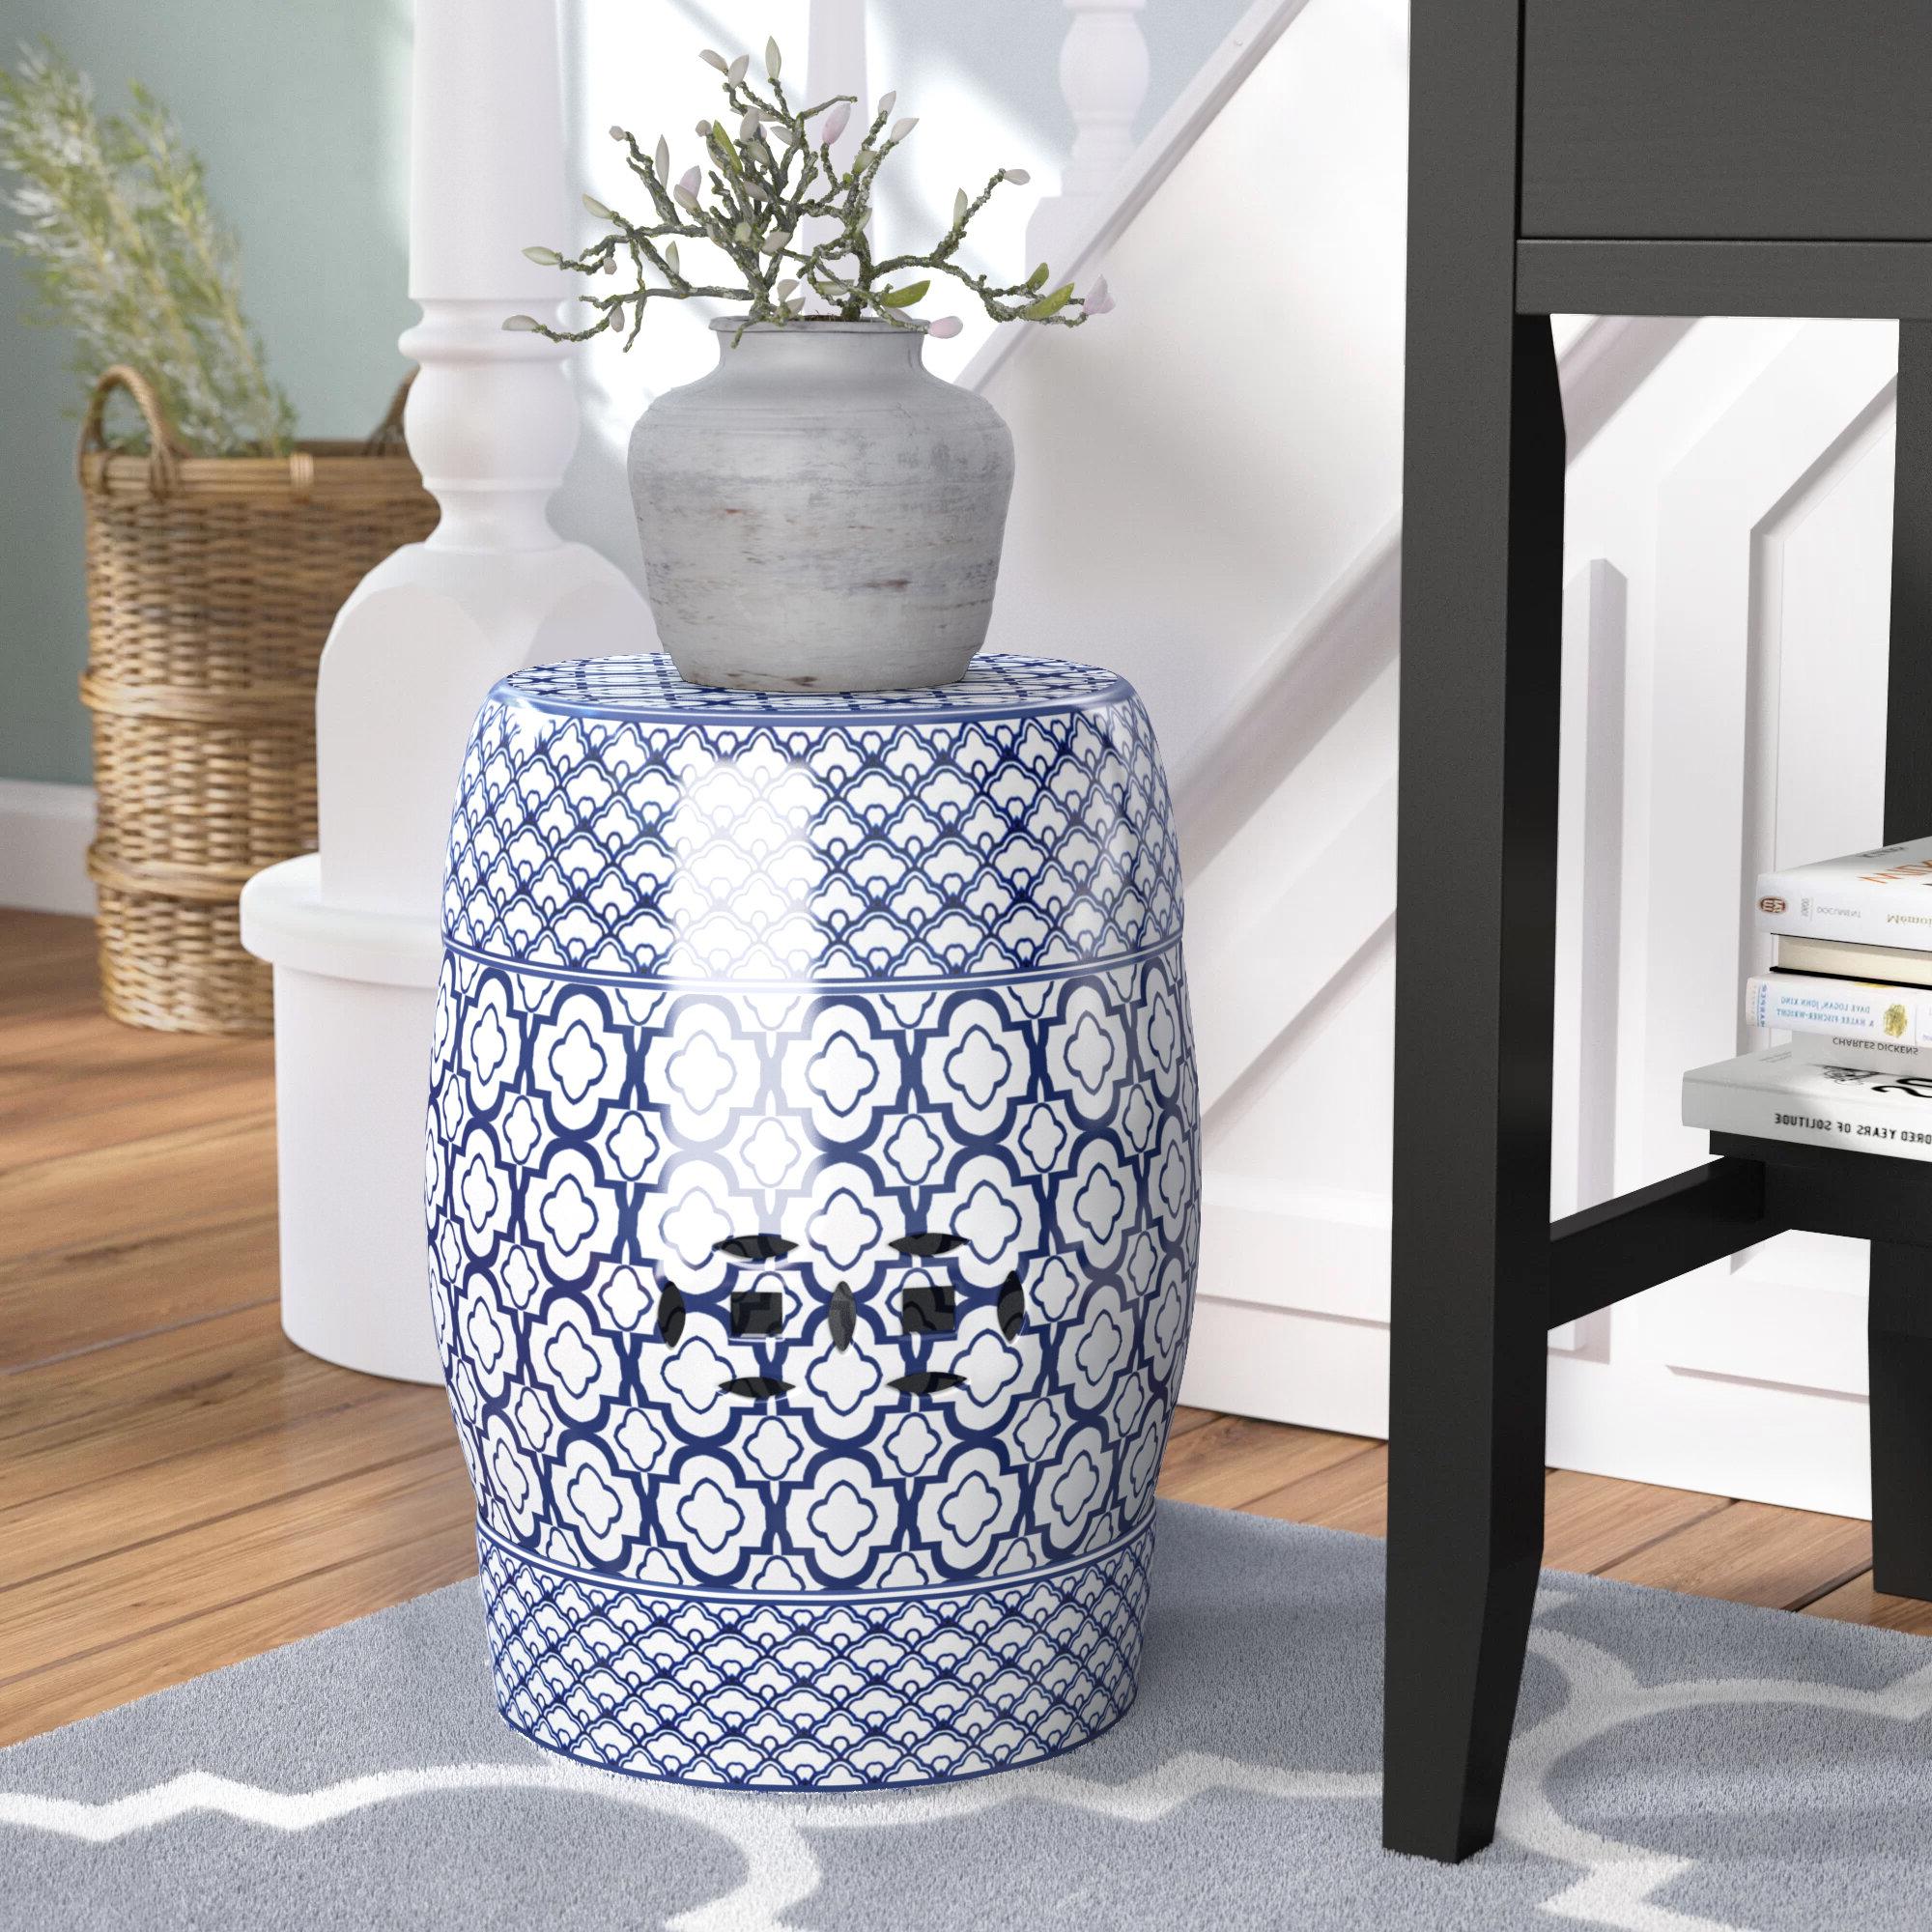 Trendy Feliciana Ceramic Garden Stools Pertaining To Blue Ceramic Garden Stools You'll Love In (View 19 of 30)